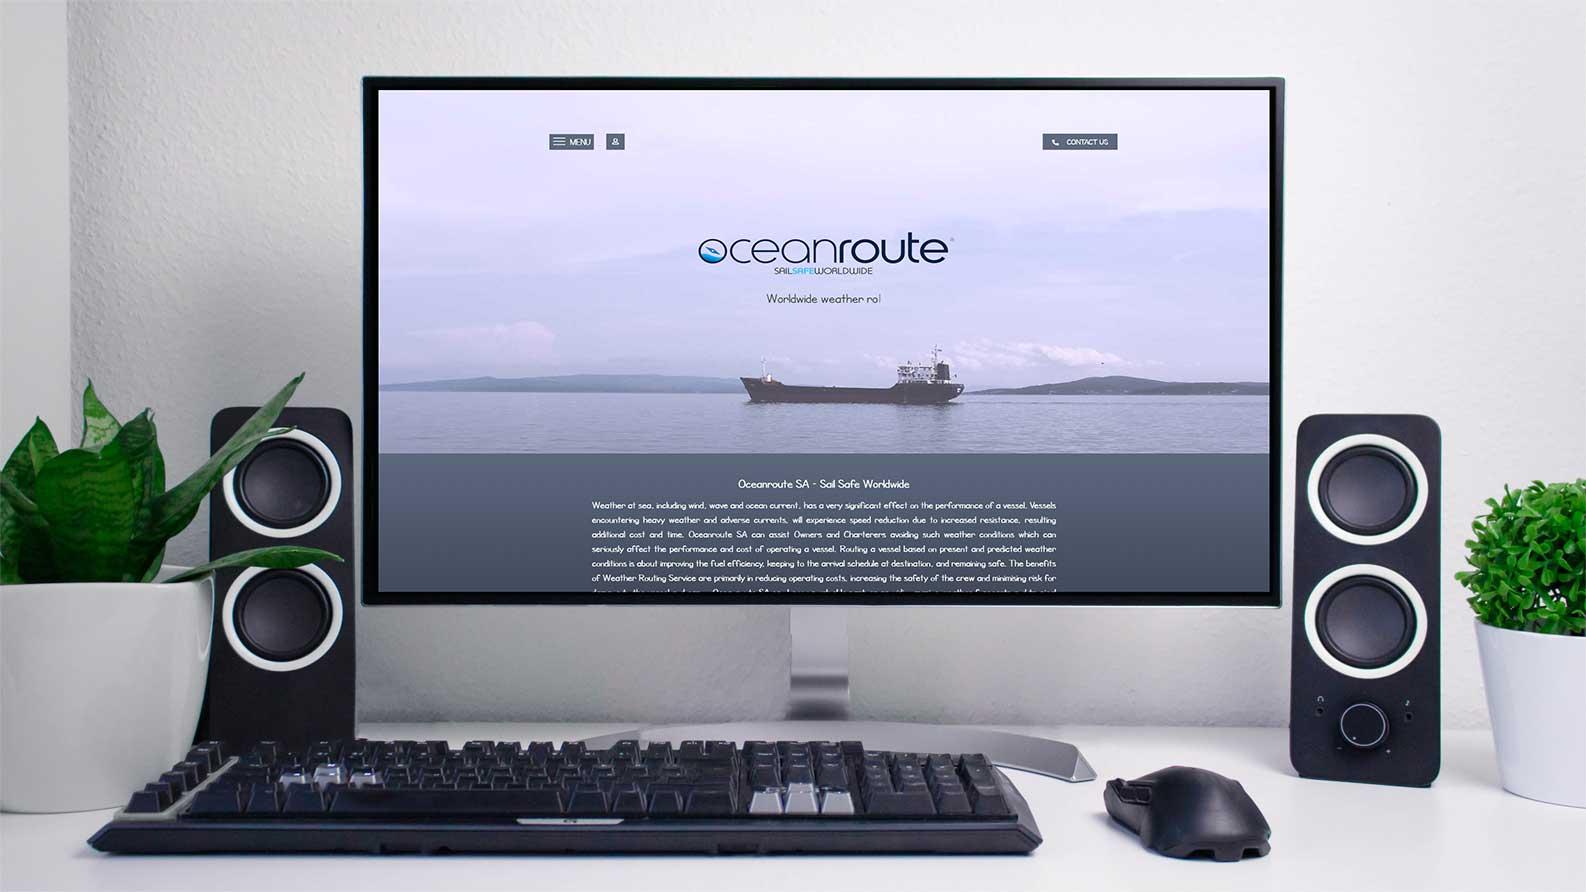 oceanroute - Oceanroute